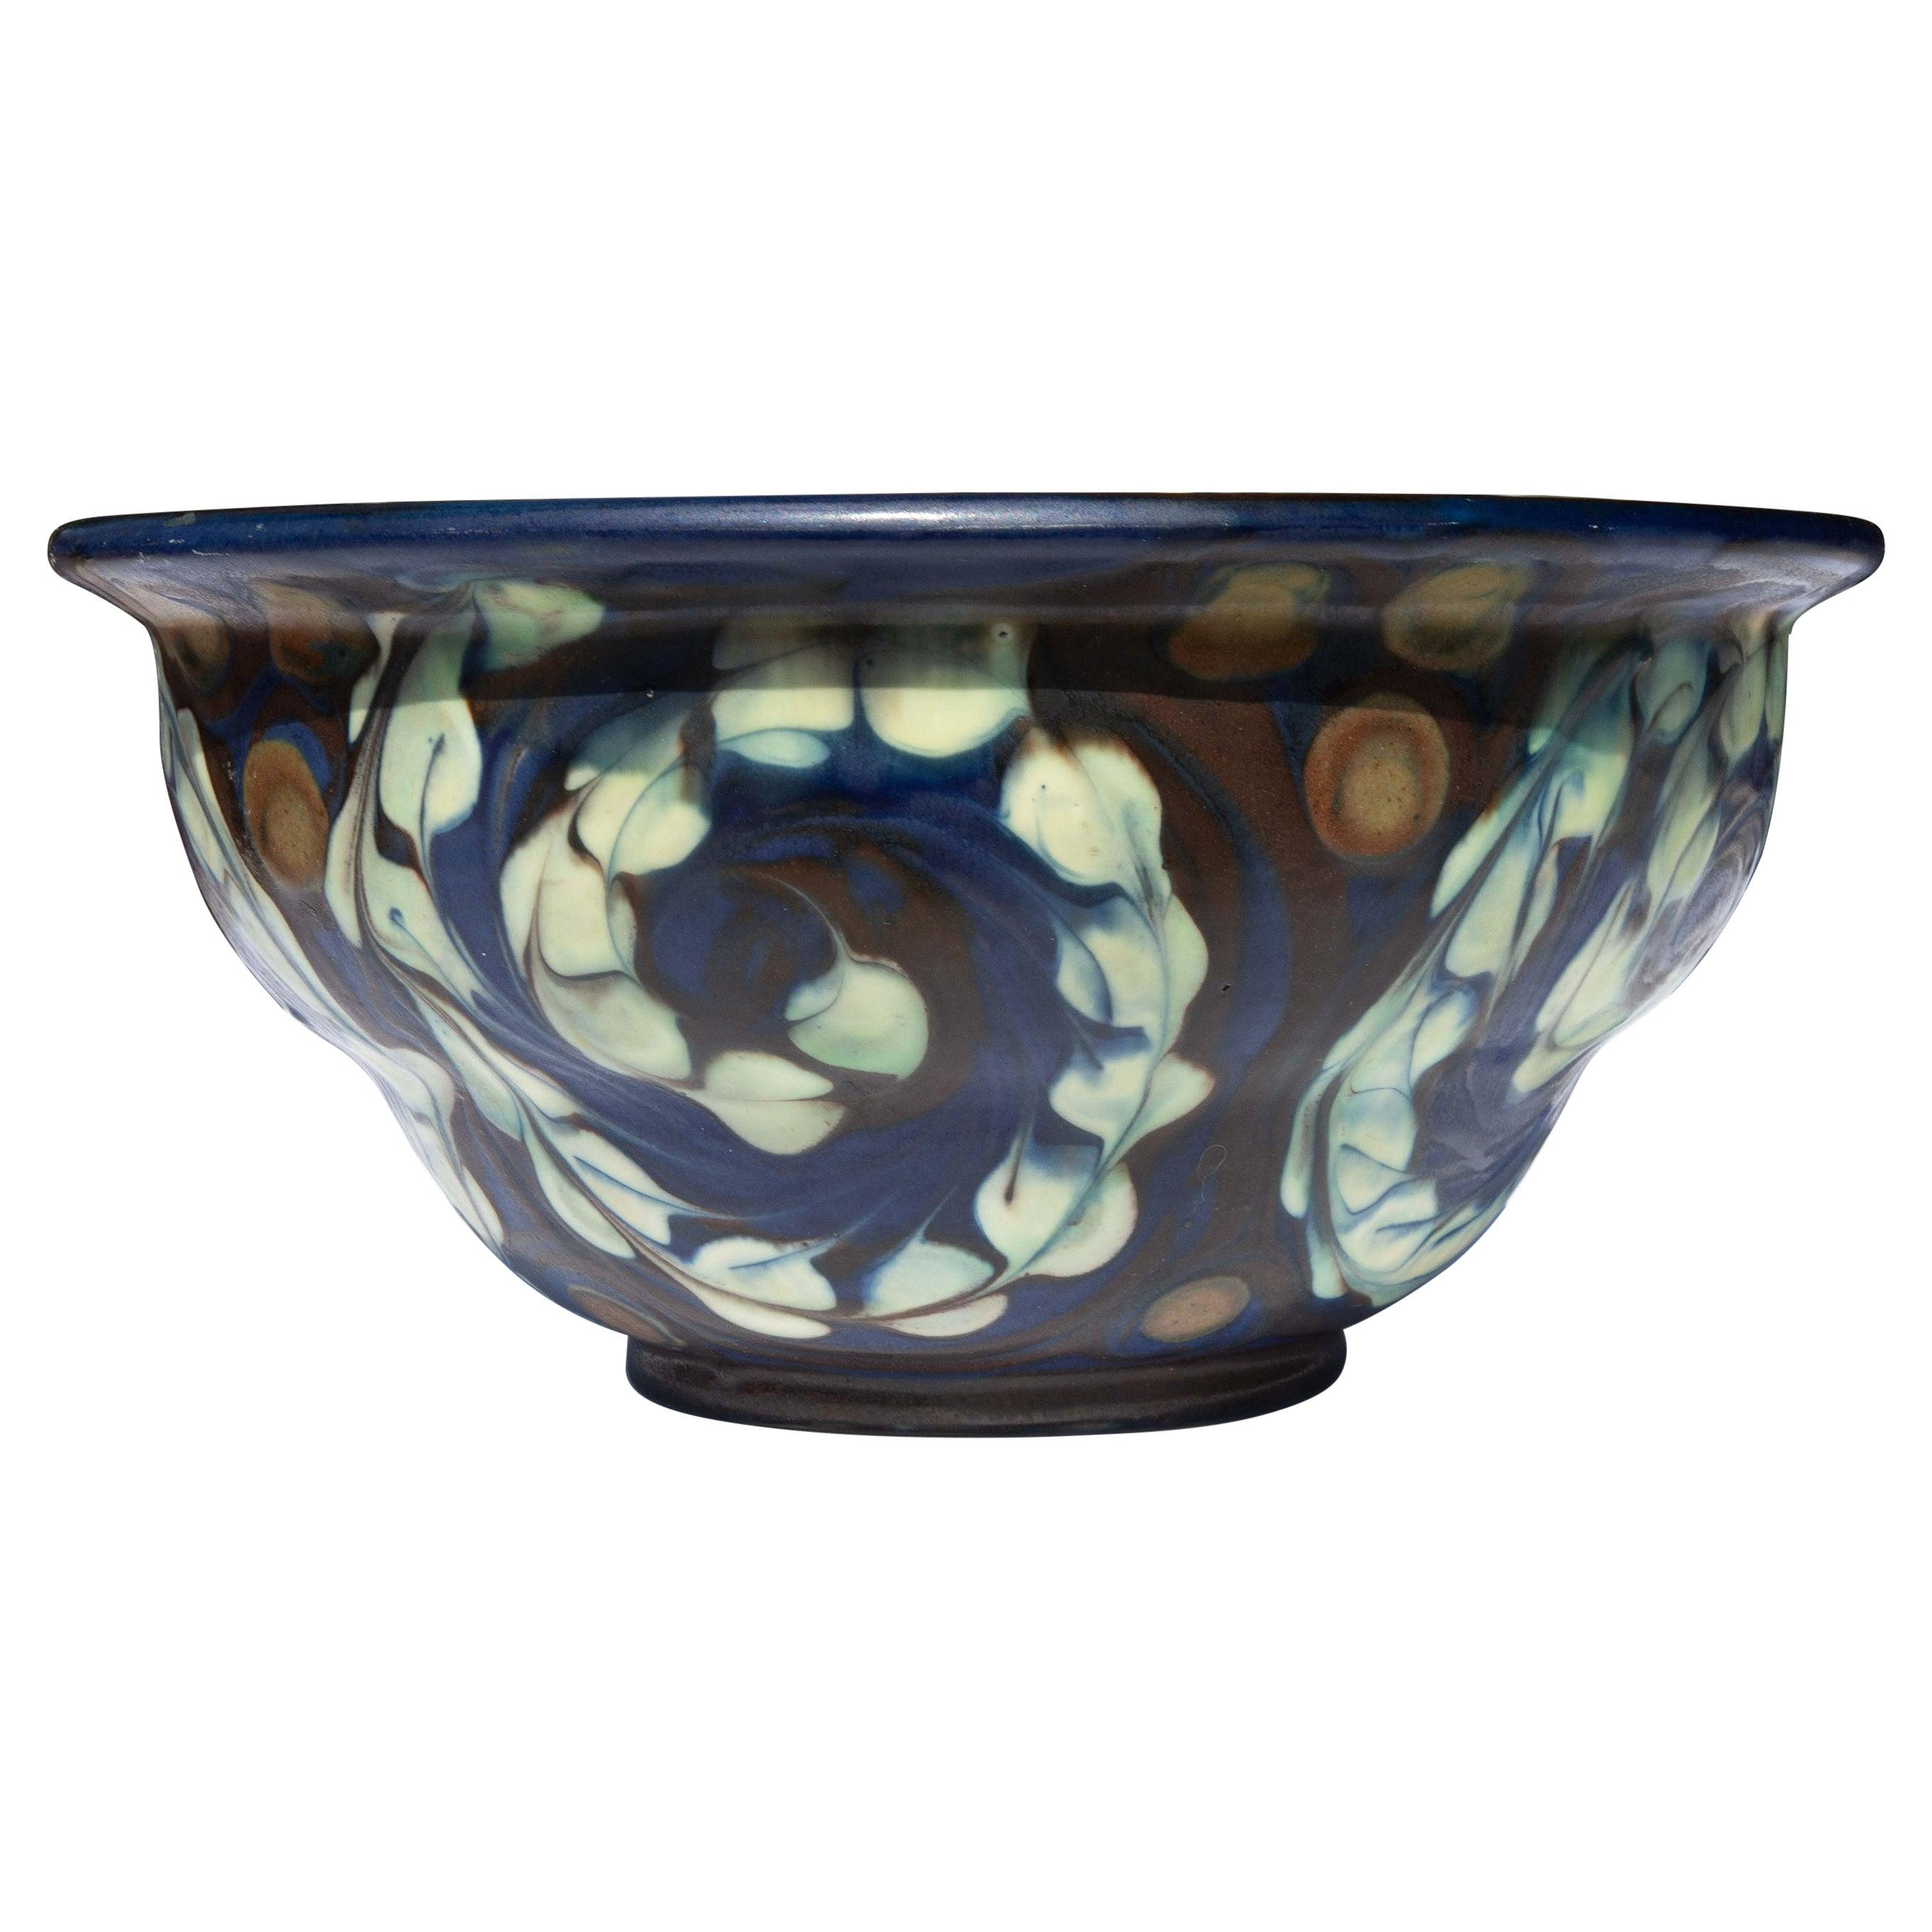 Art Pottery Bowl by Herman Kähler, Denmark, Circa 1930's